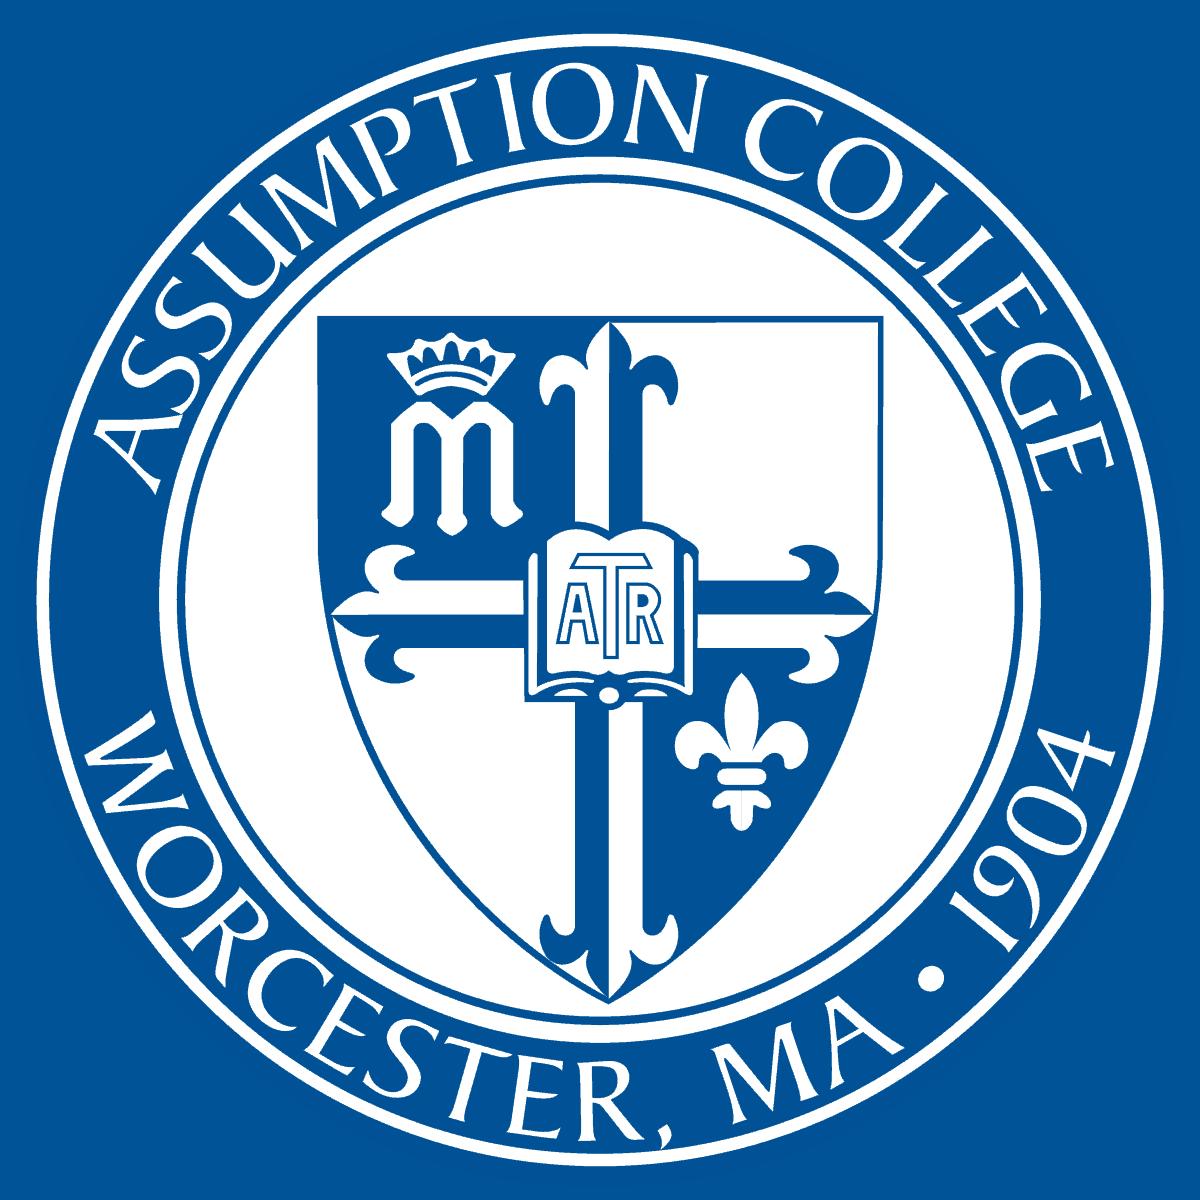 graduate studies assumption college logo 45259